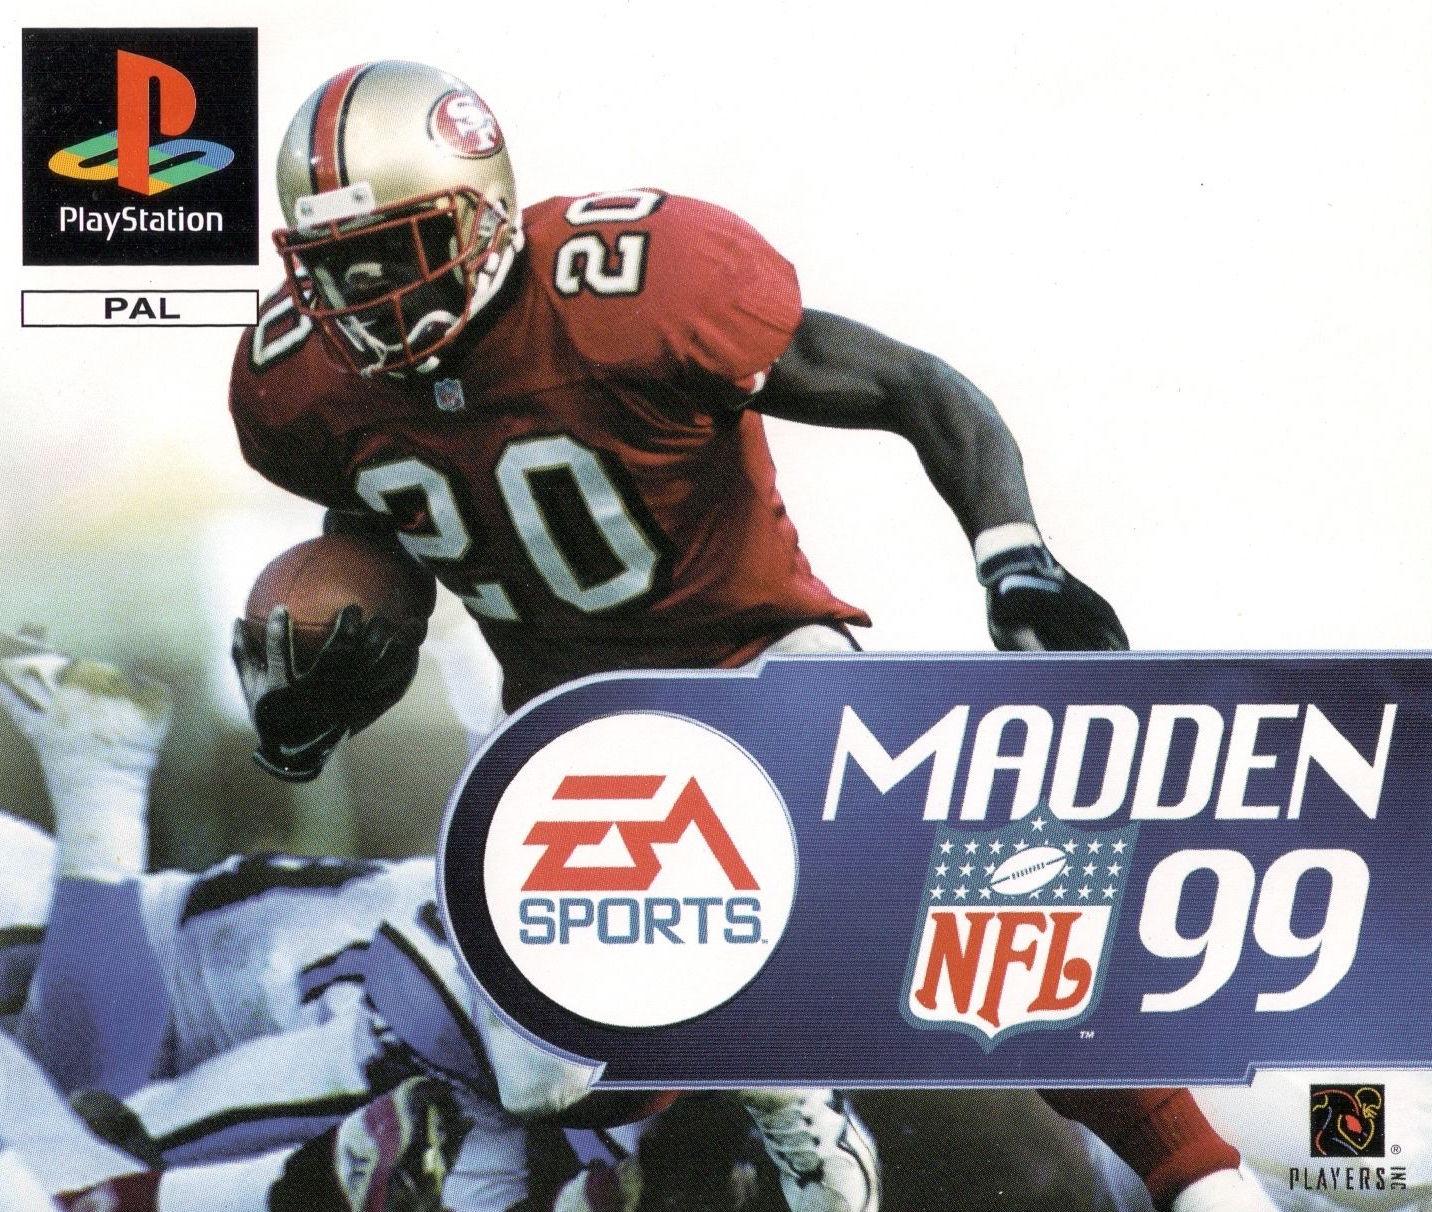 Madden 99